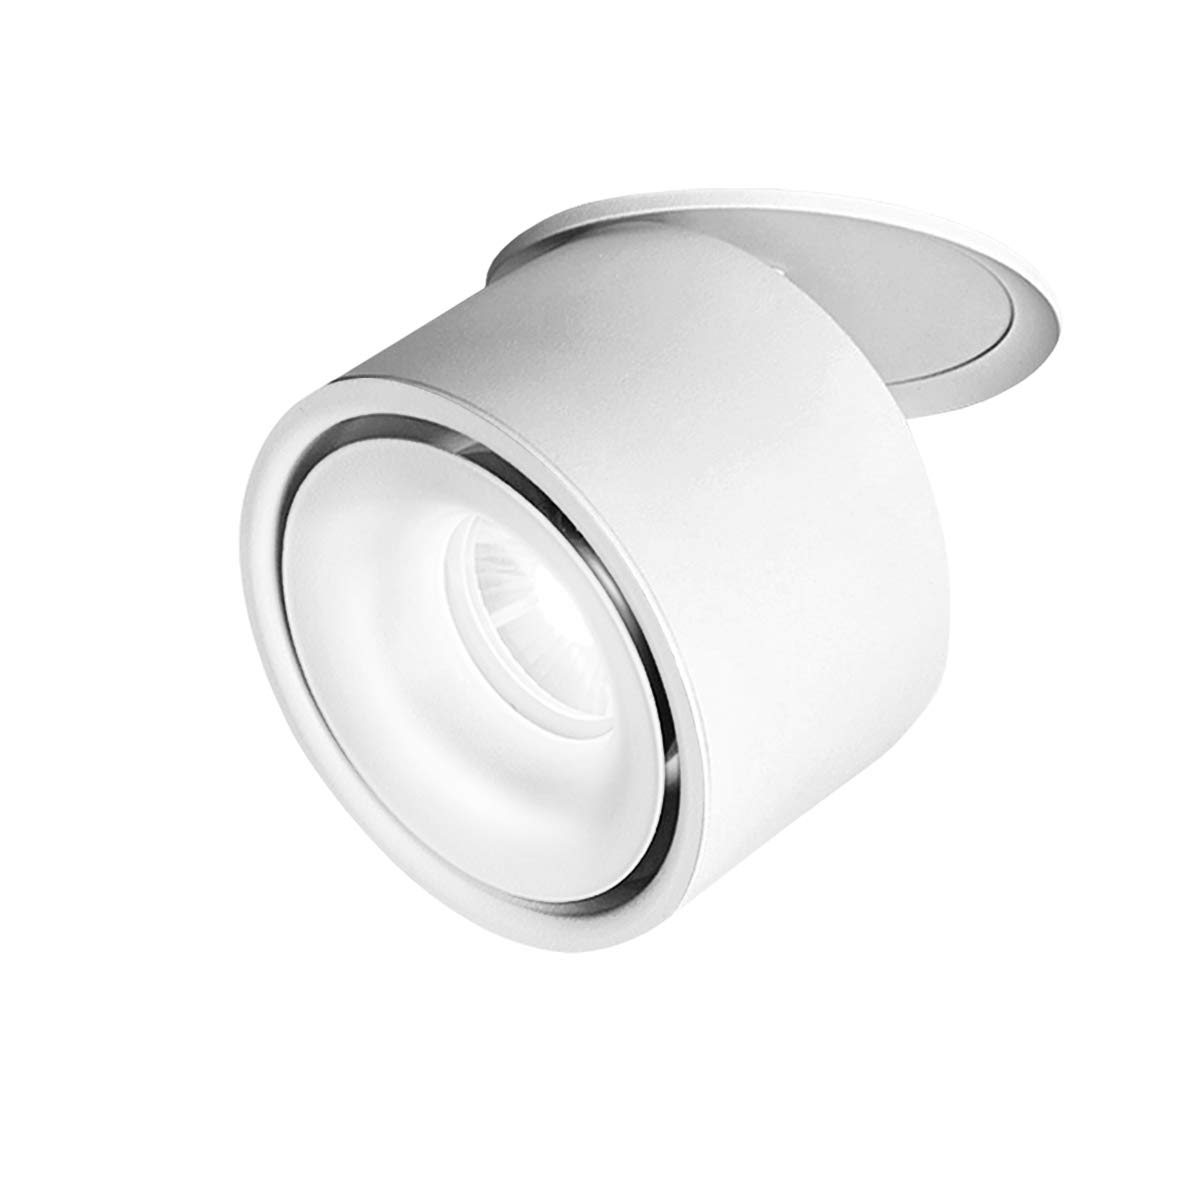 TOPMO Indoor 10W LED Ceiling Fixtures Recessed Ceiling Spotlights/360°Adjustable Ceiling Downlight/10X8CM/Aluminum Spot Light (White 6000K)